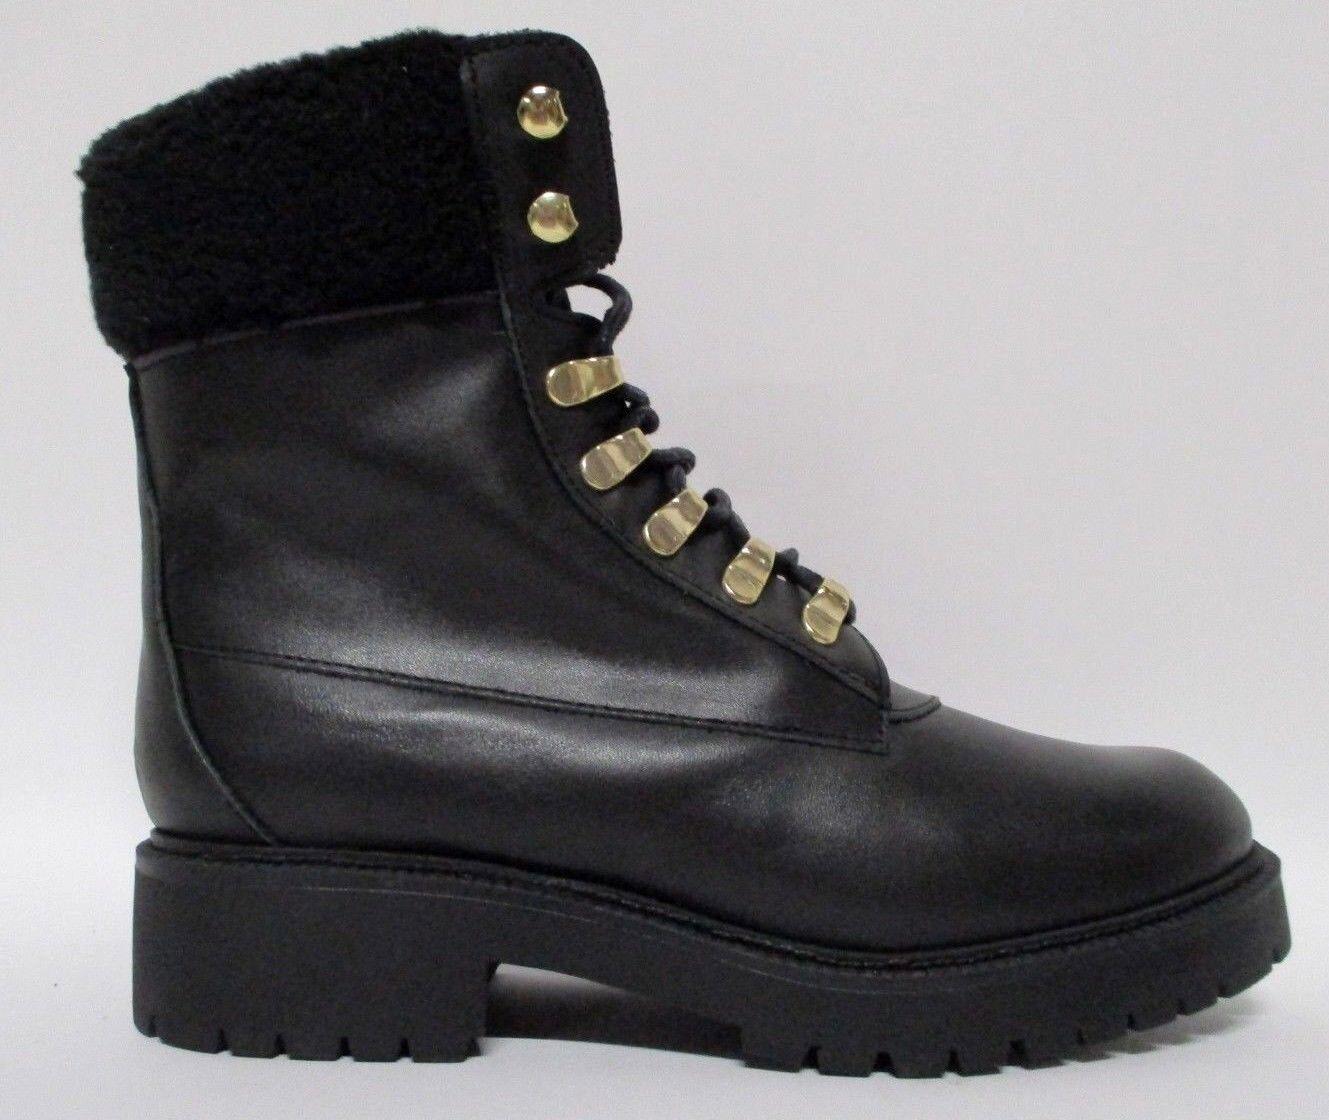 Zign bota botas ata cuero negro Gr. 39 c50